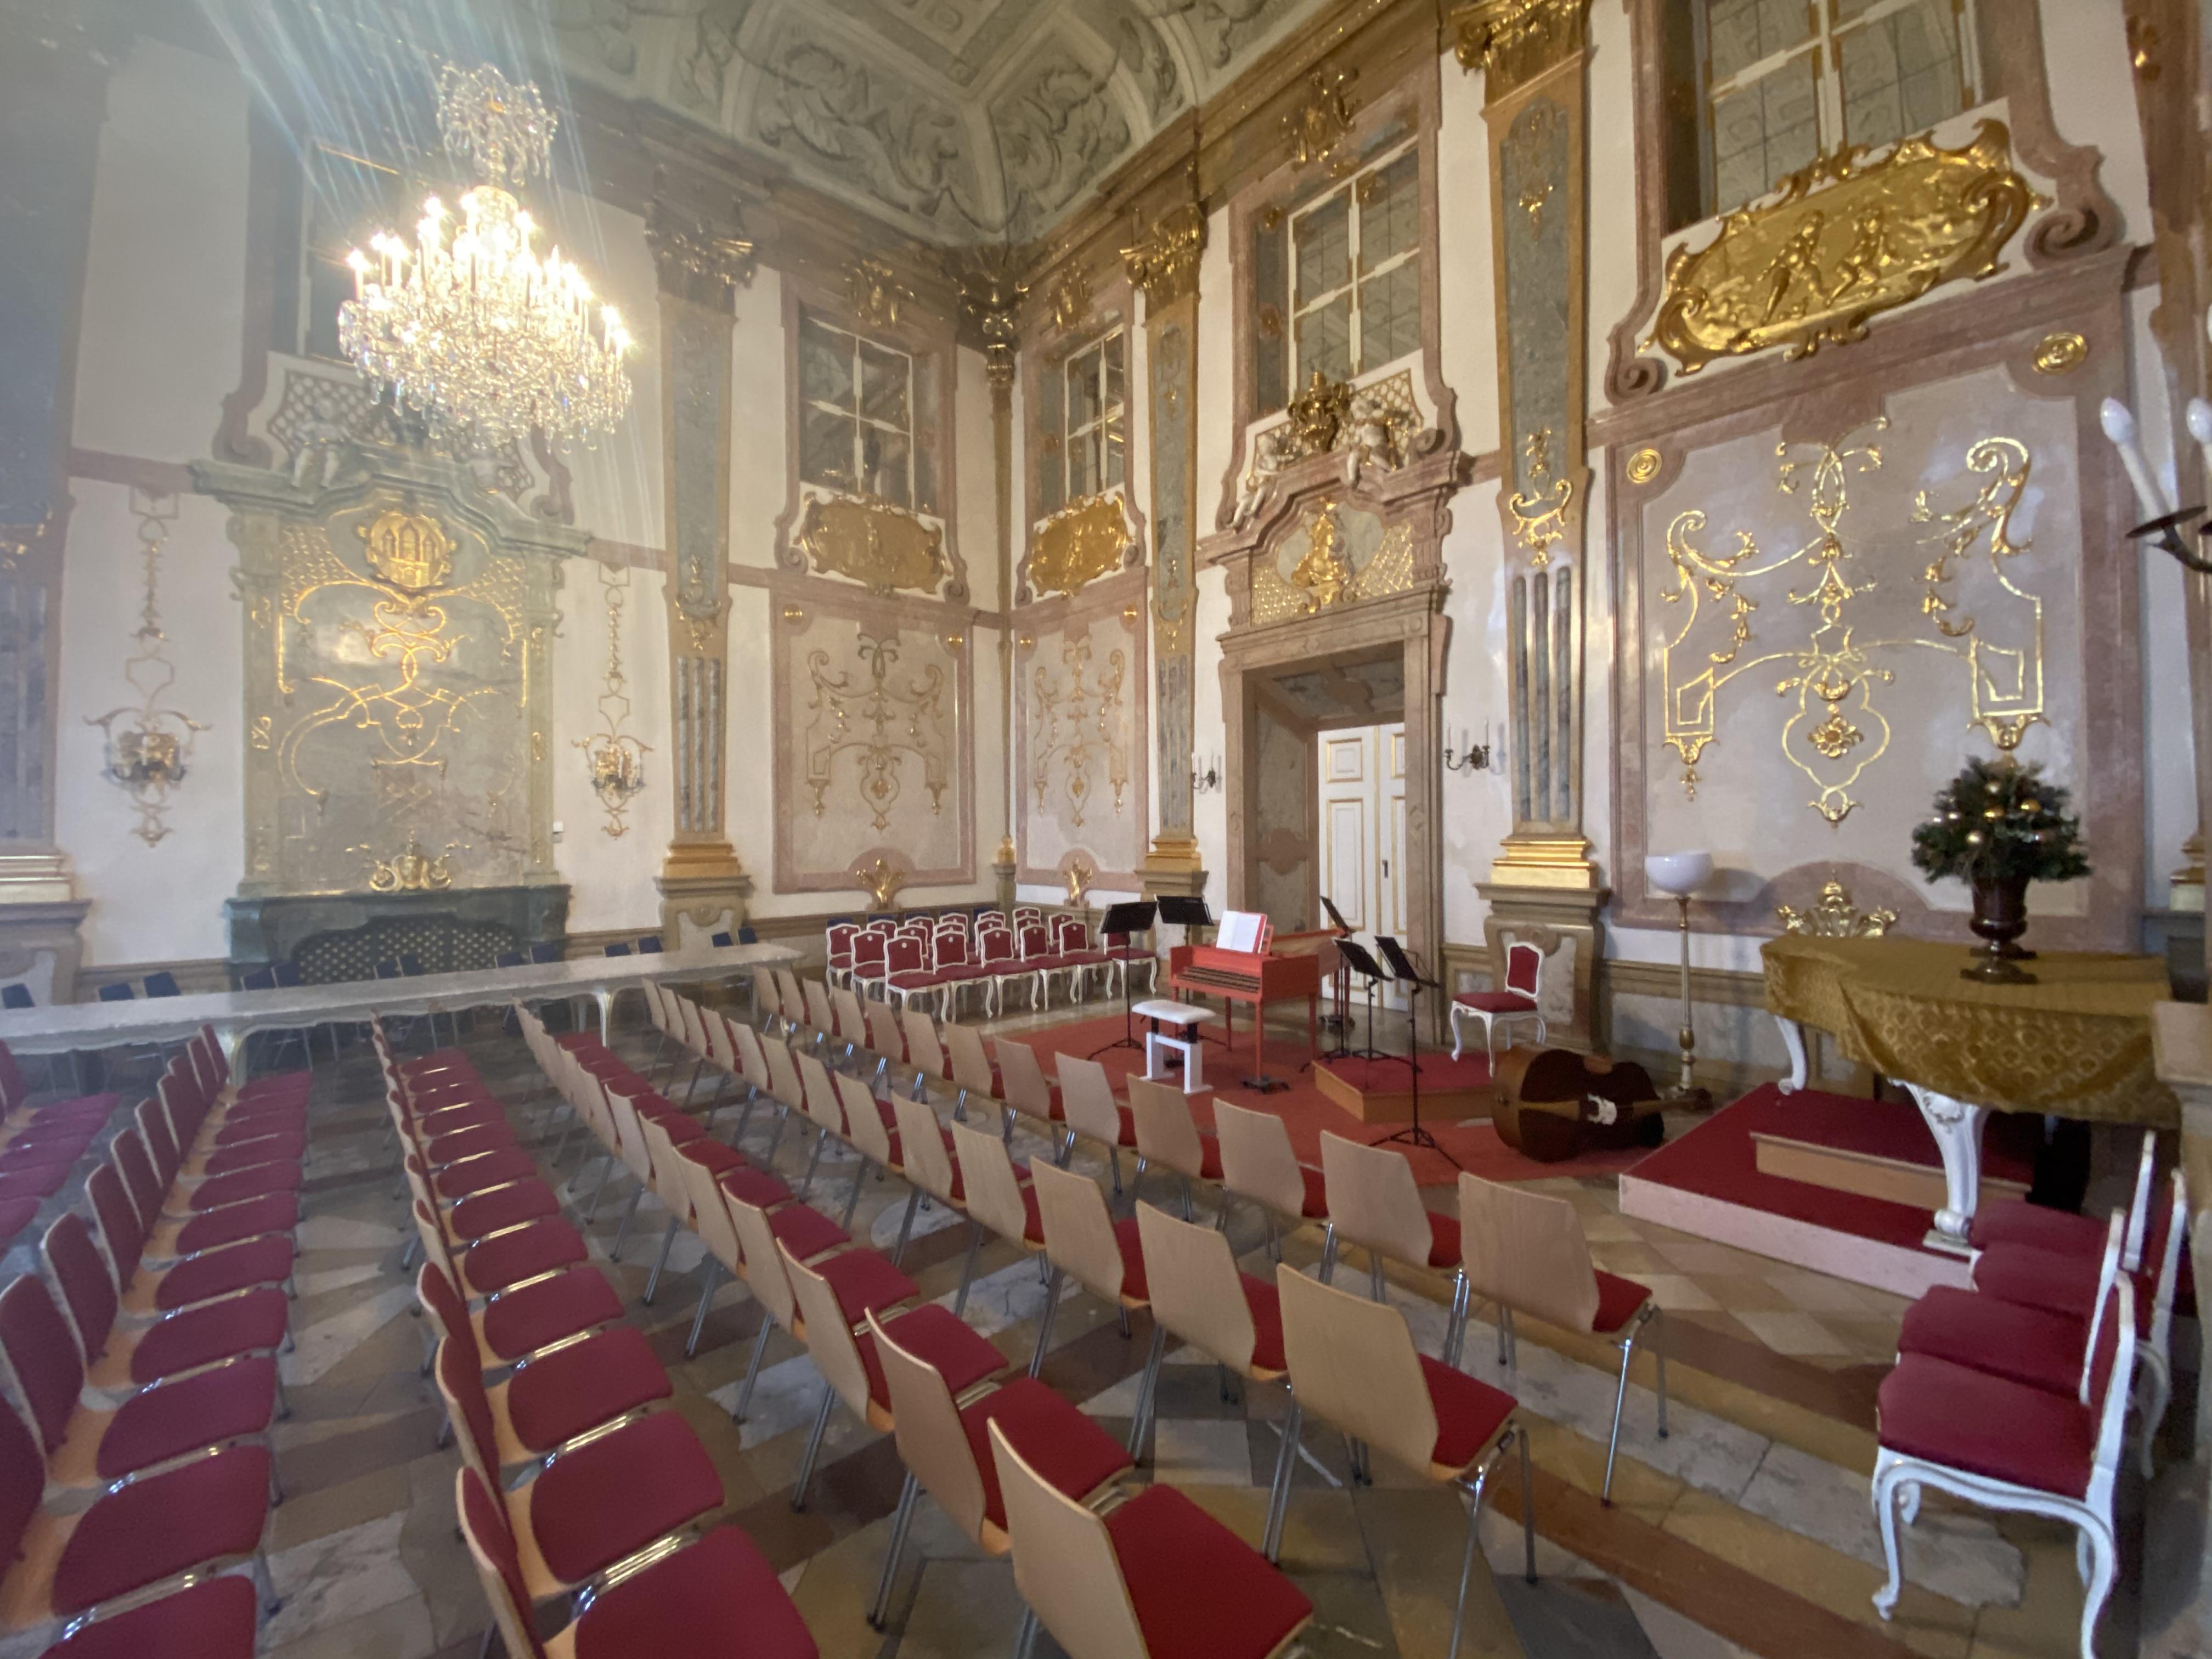 Marble Hall at Schloss Mirabell.